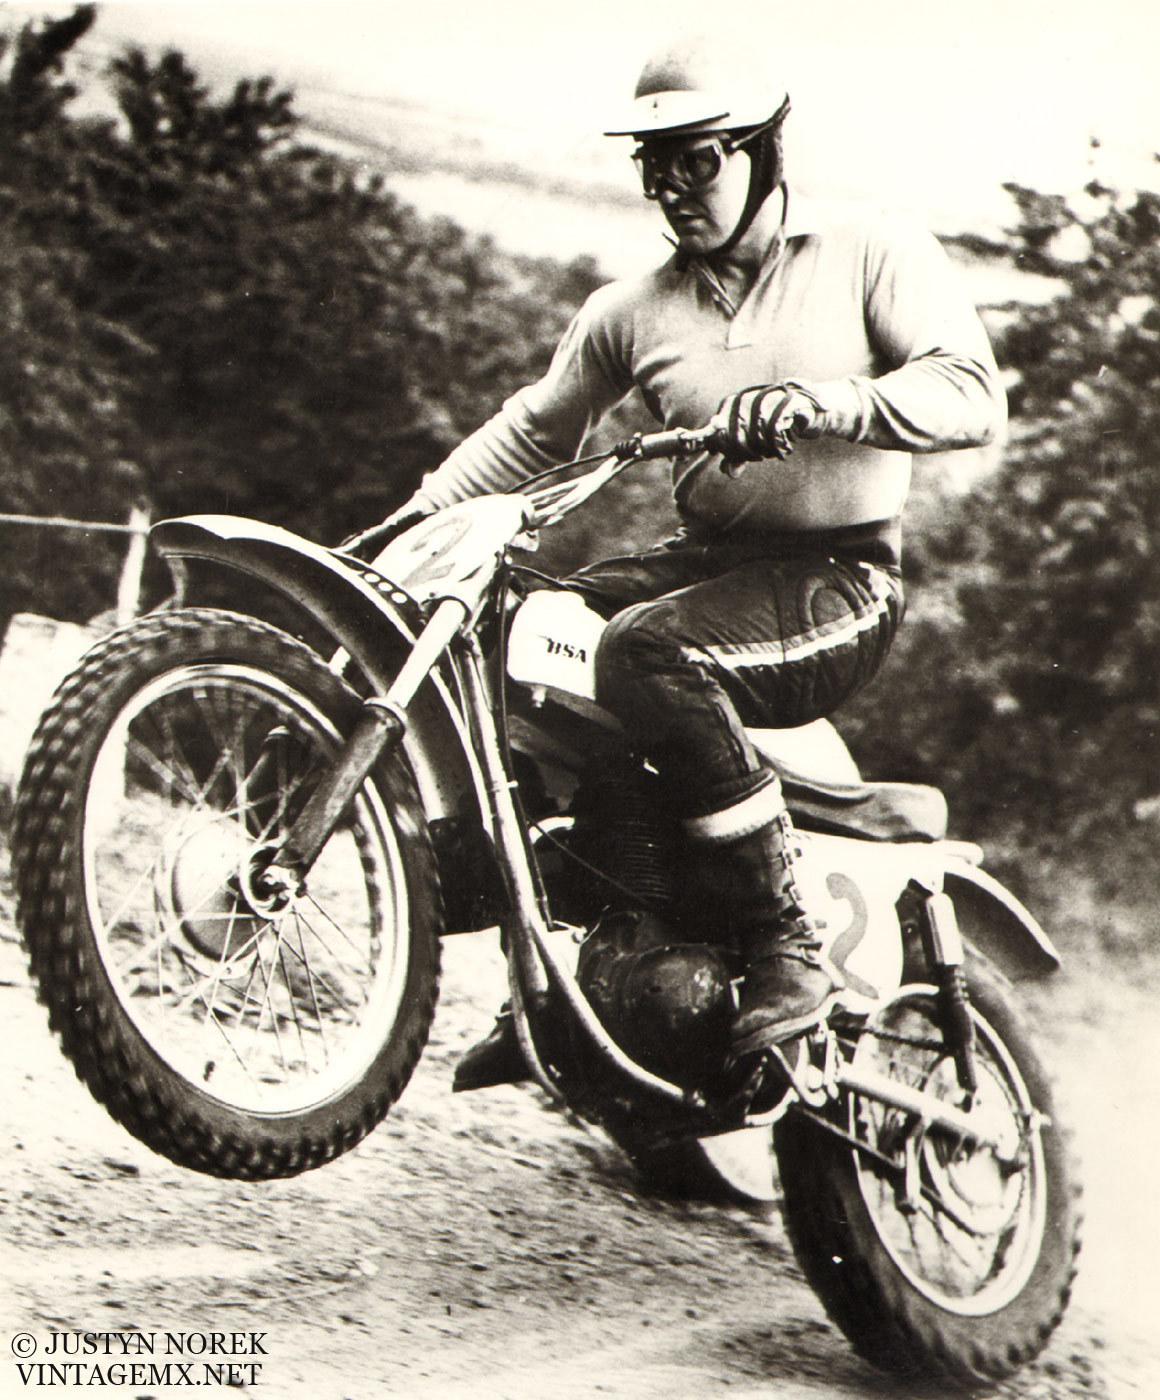 vintage-GP-1960s-19.jpg#asset:37249